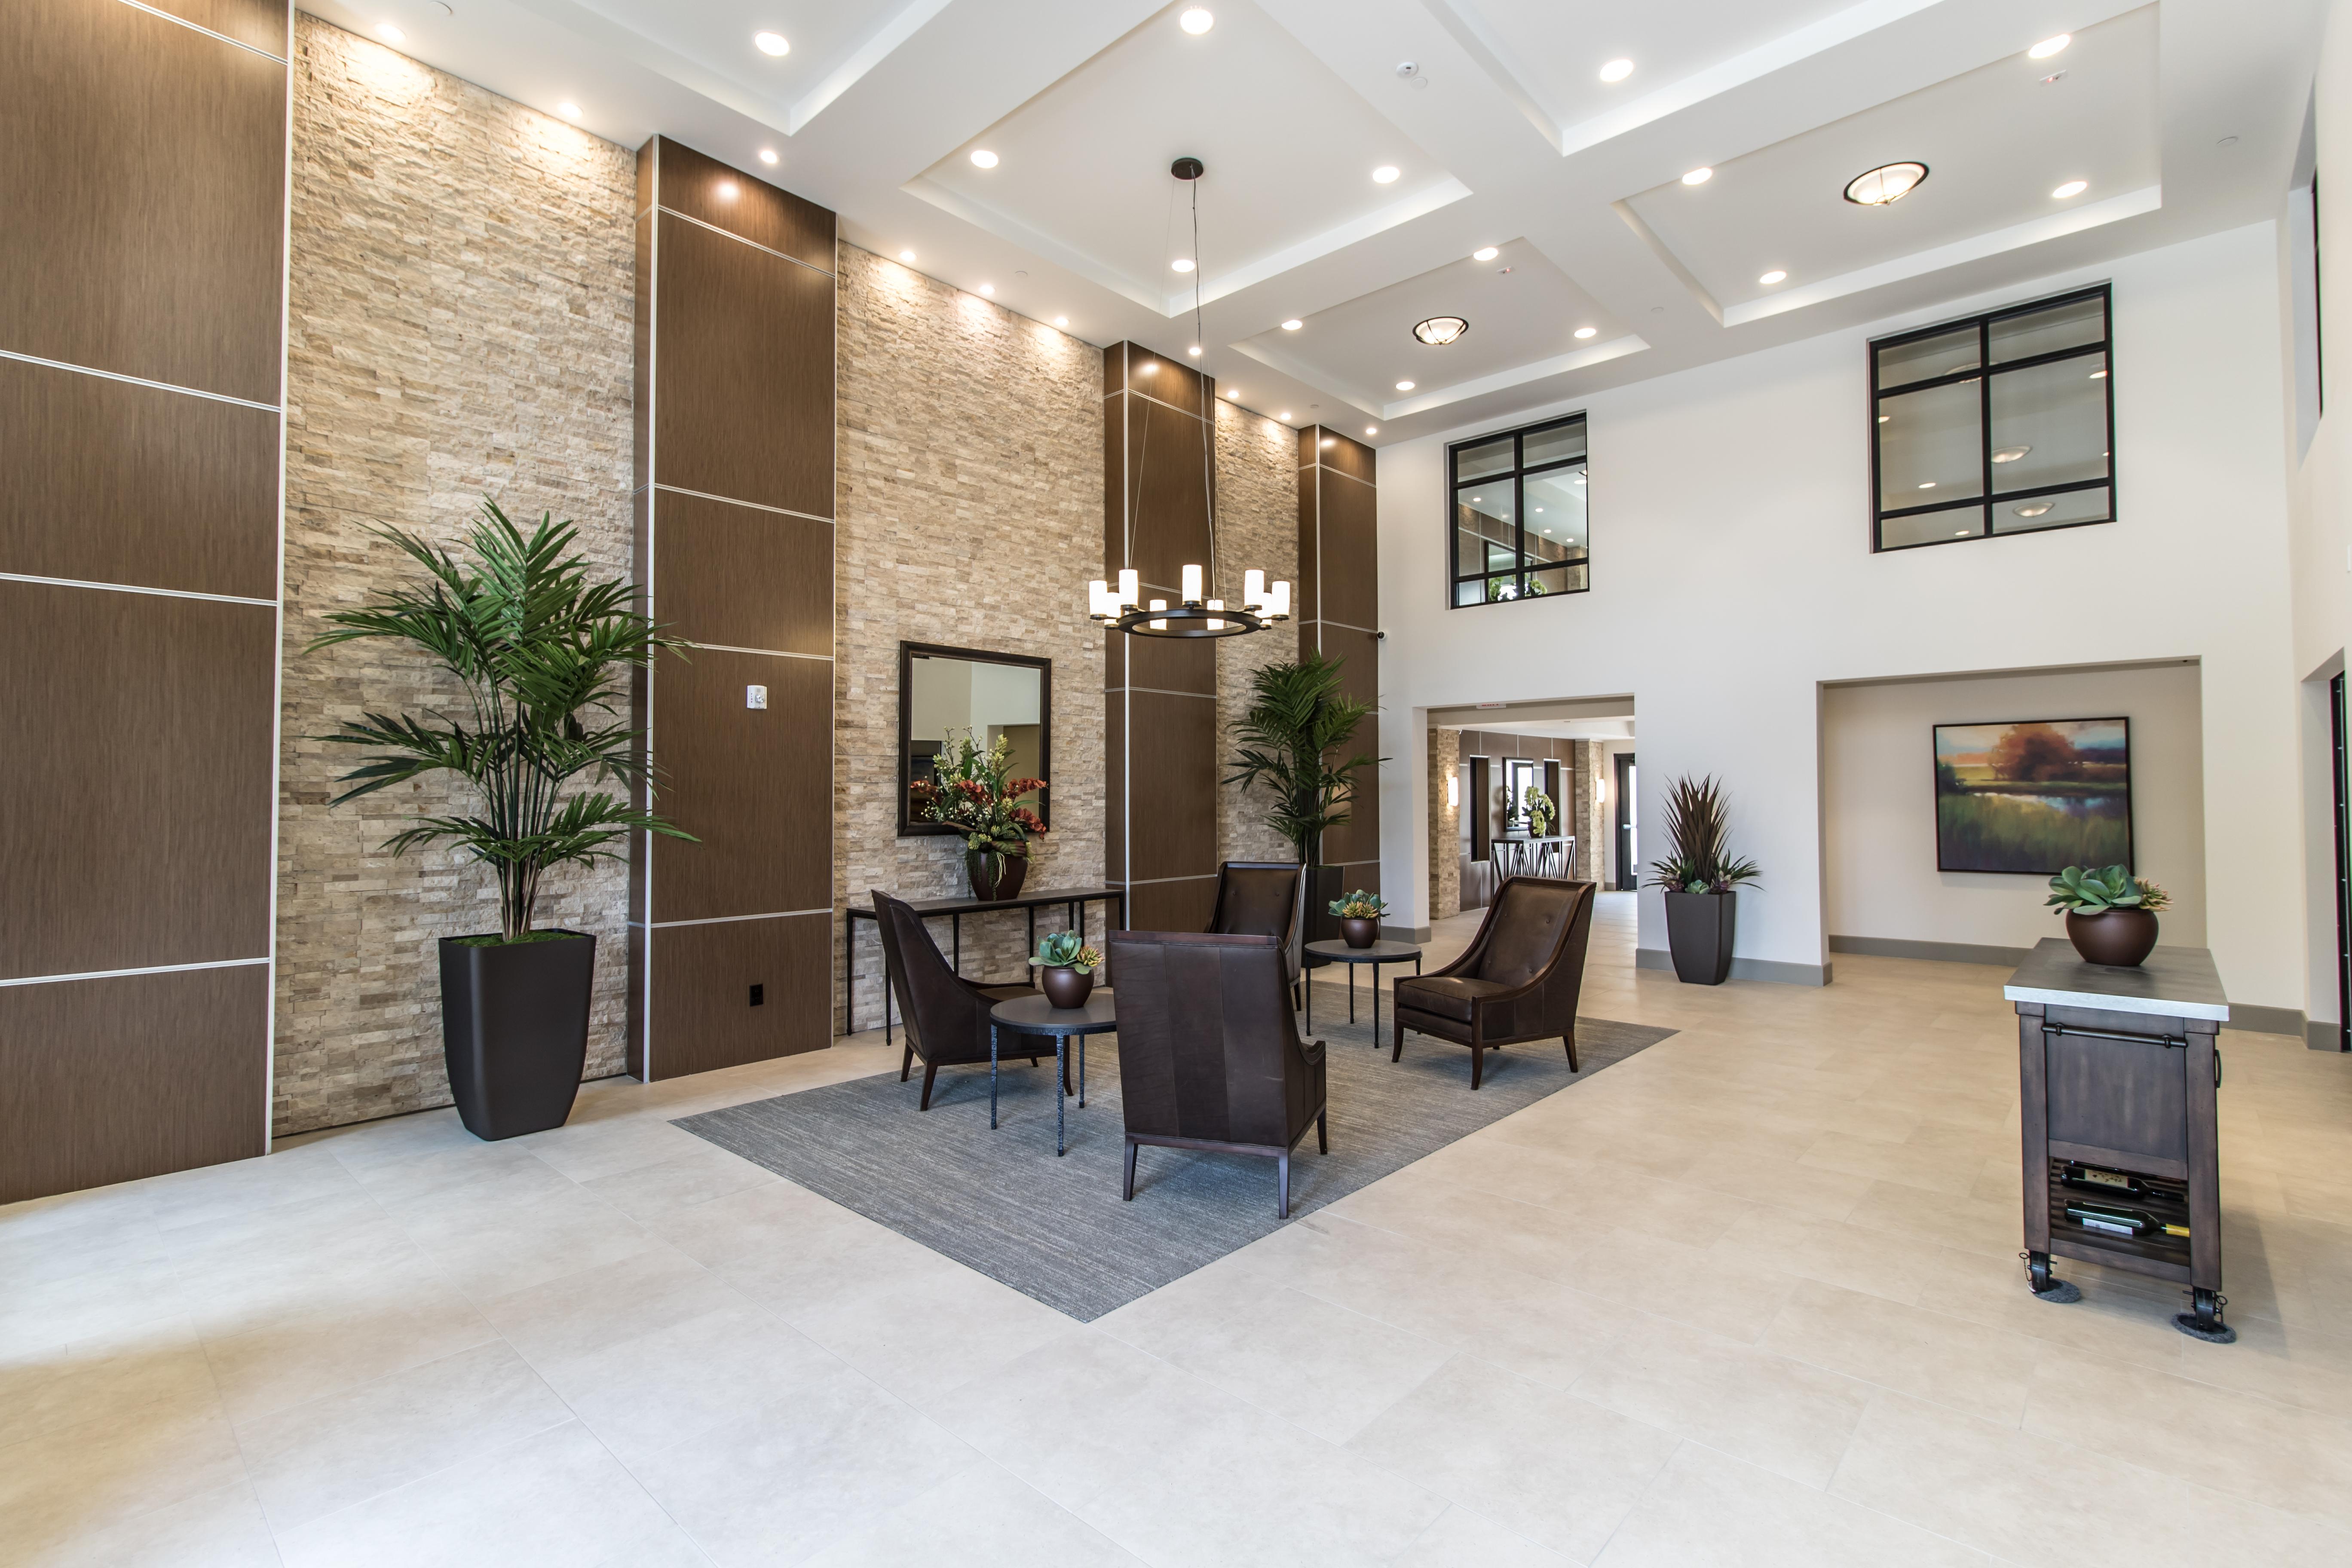 bal lobby